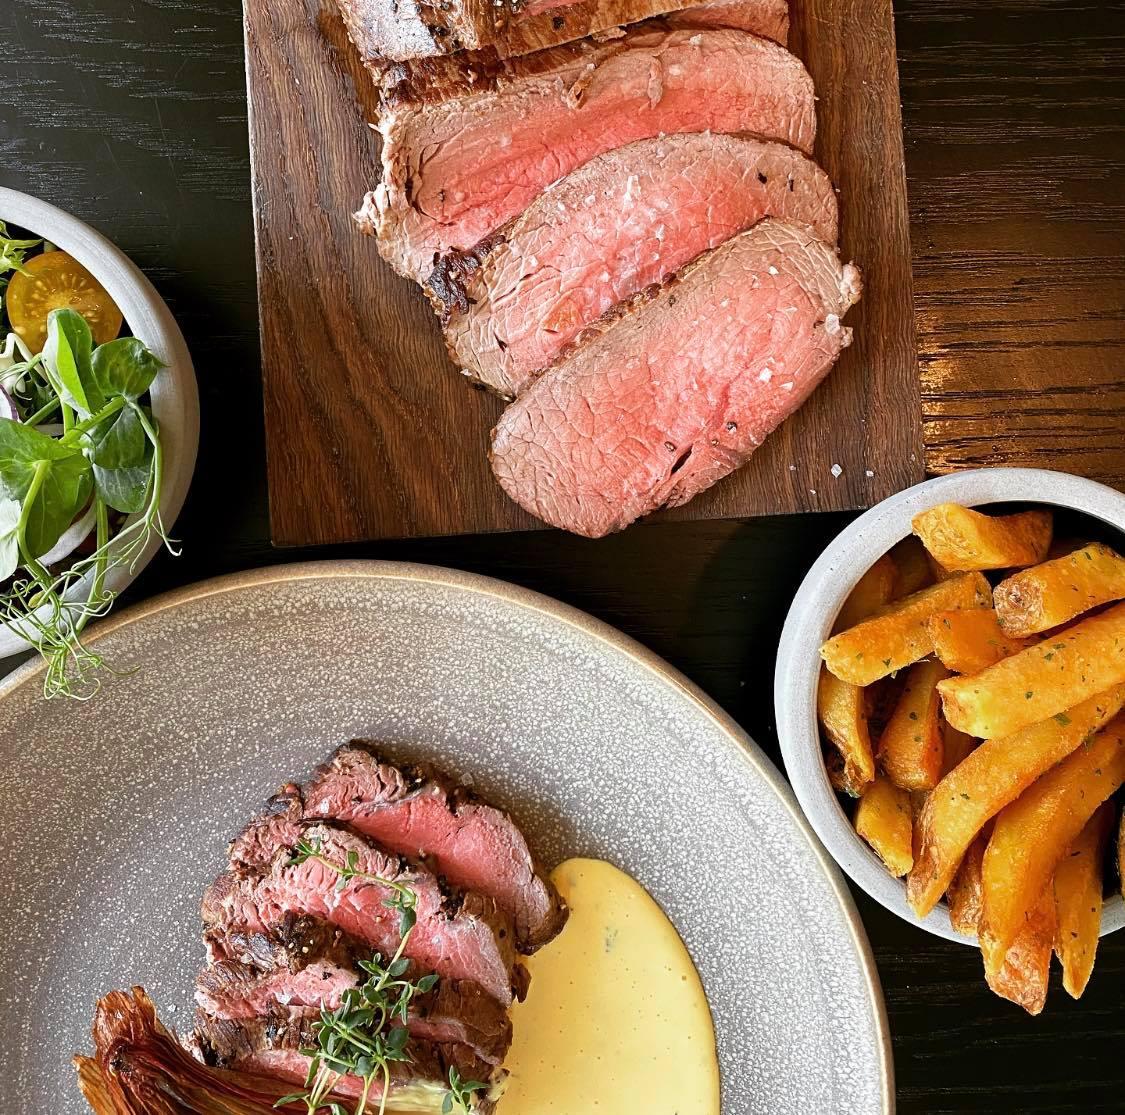 Café gentager stor succes: Få kød, fritter og bearnaise ad libitum